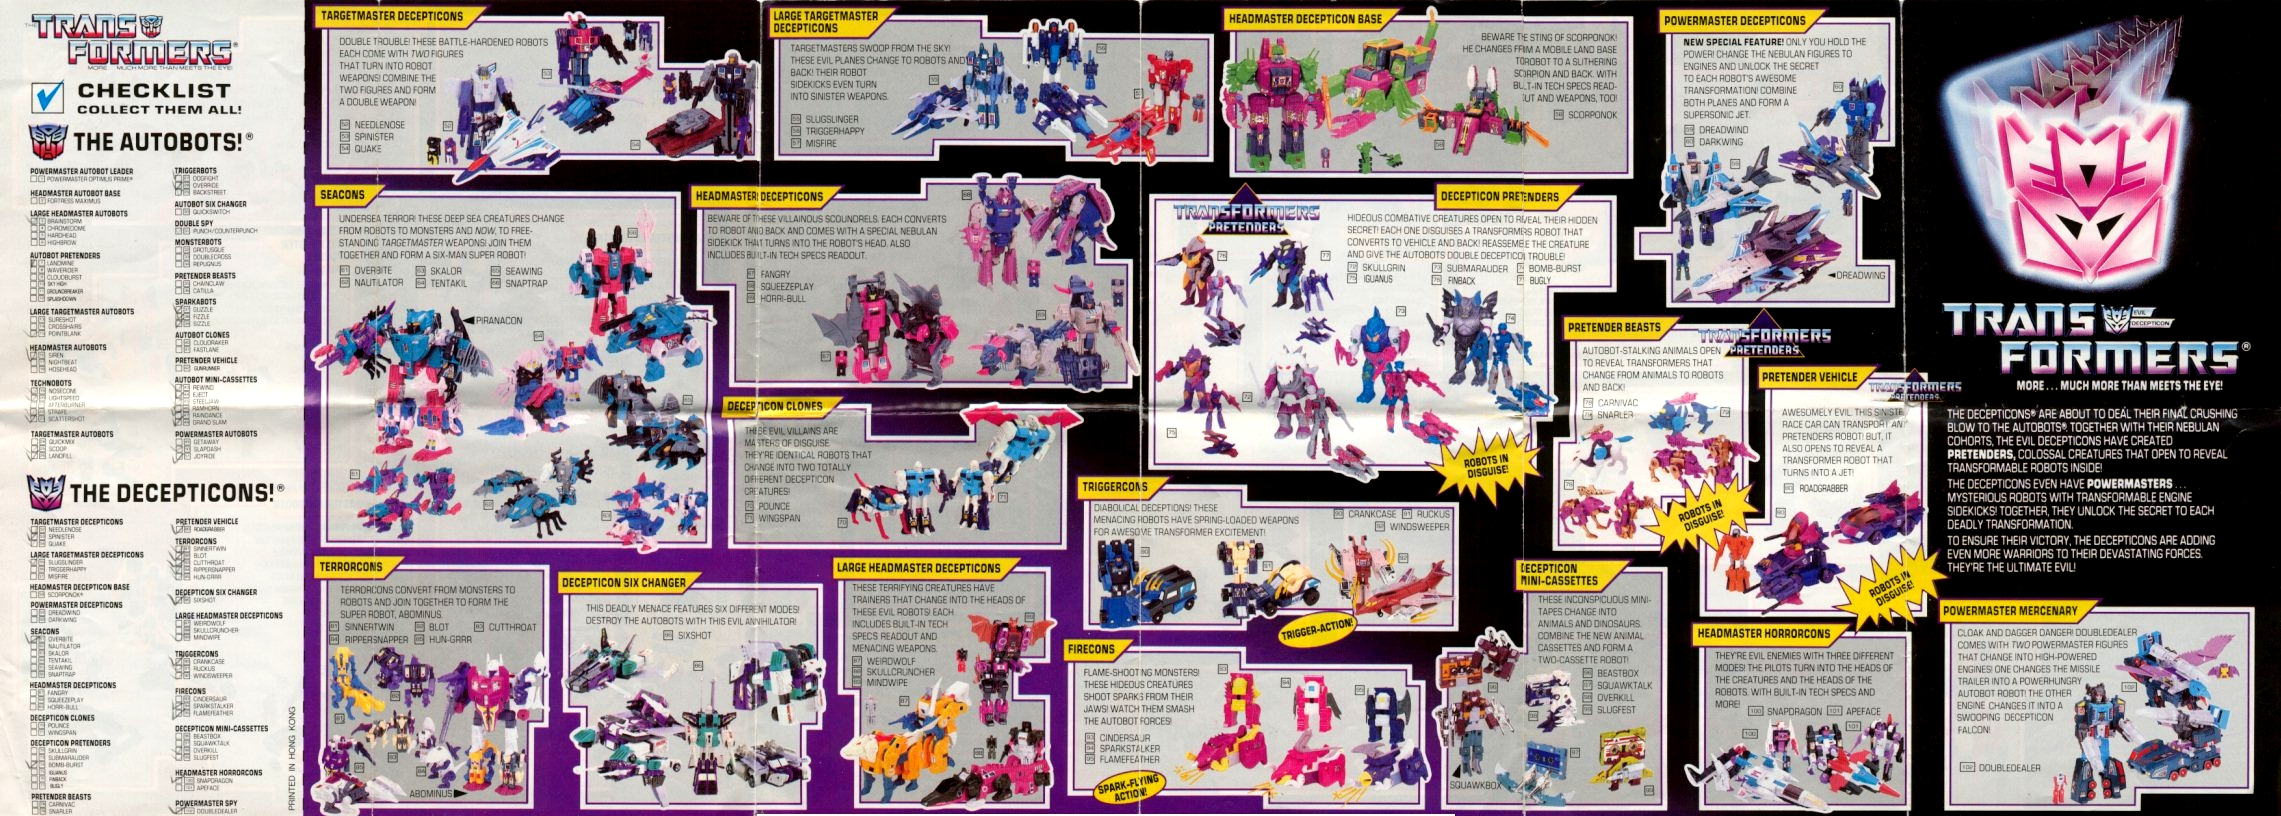 Botch The Crab Transformers Catalogs 1988 Catalog Side B